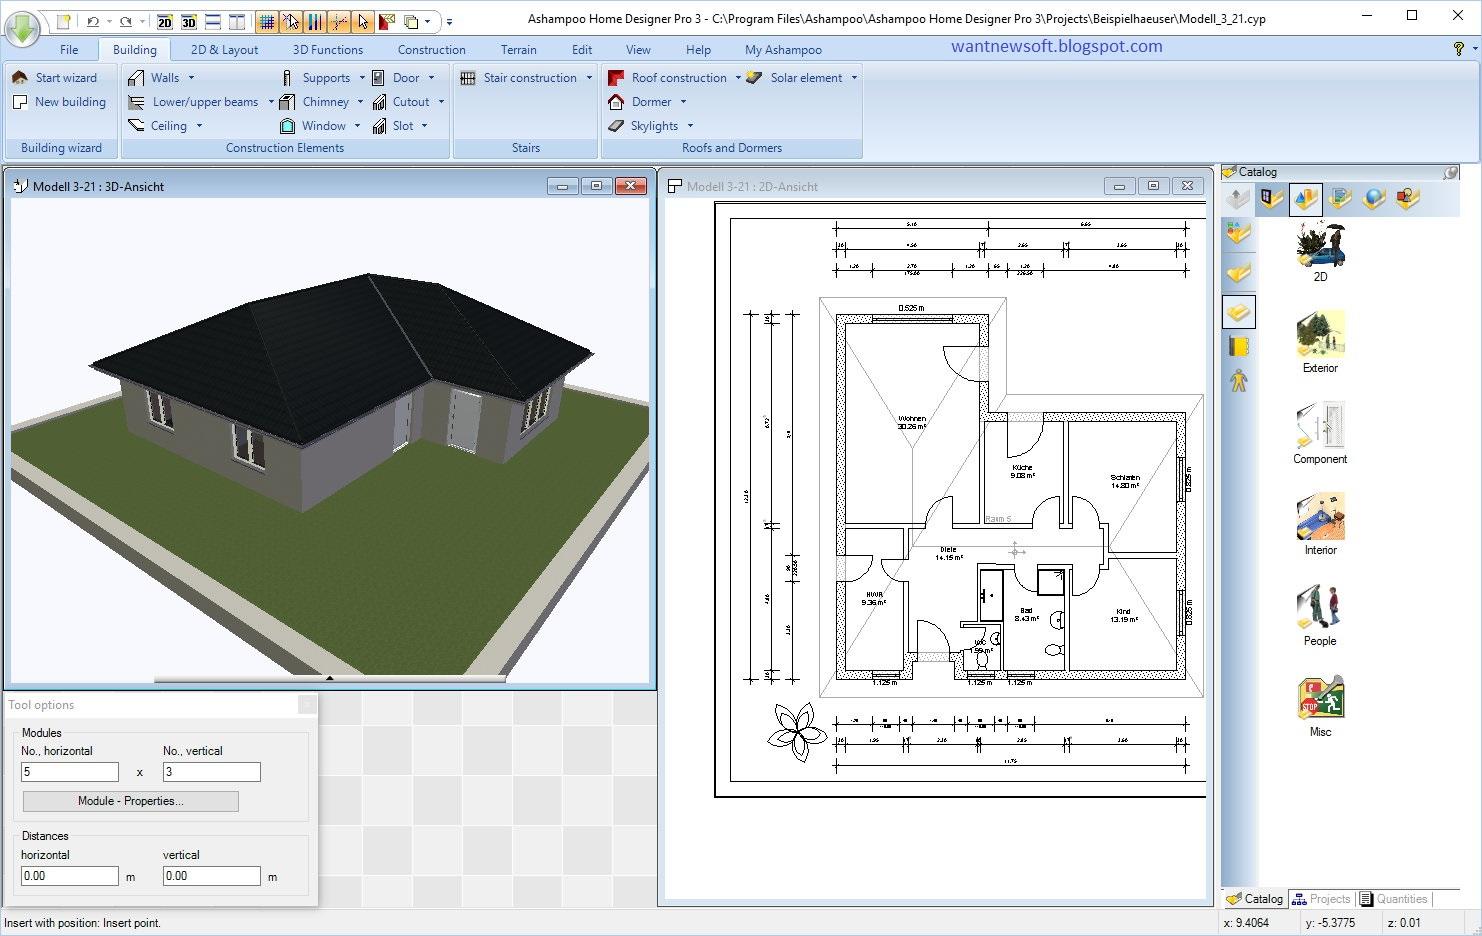 Ashampoo home designer pro 3 free download with license for pc - Home designer suite free download ...